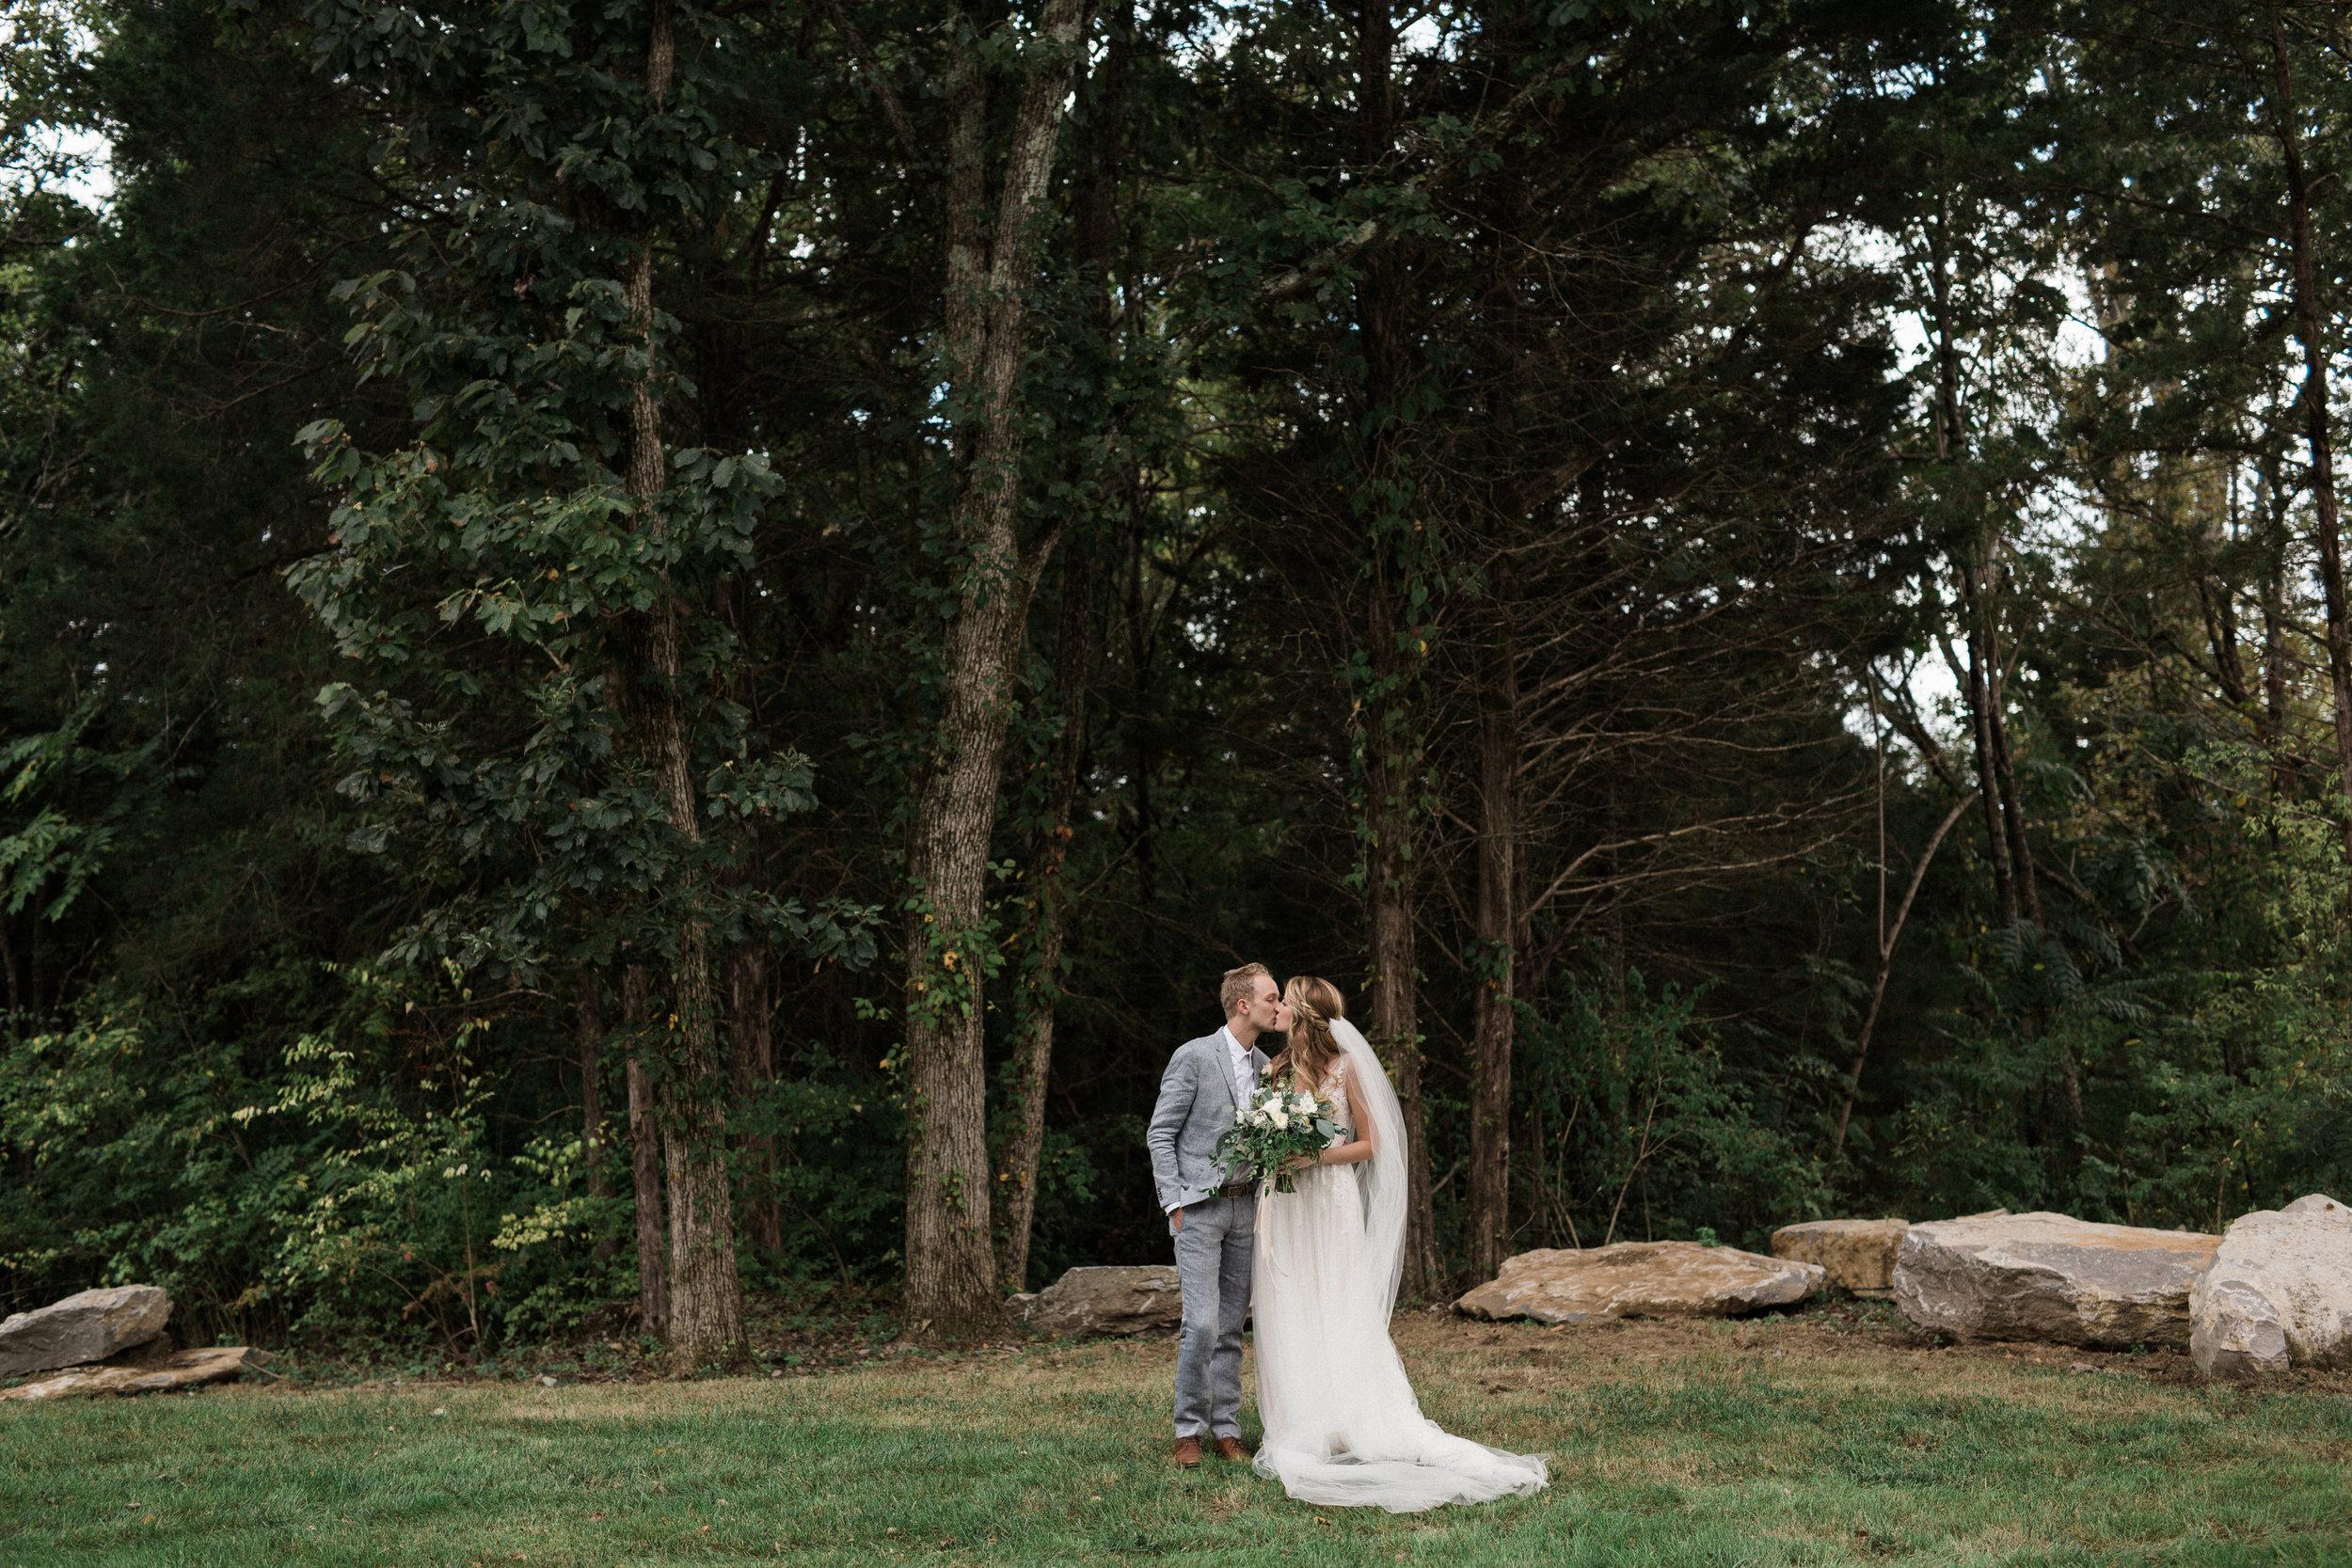 Mikaela Hamilton- Ben & Emily- bridal party-6.jpg